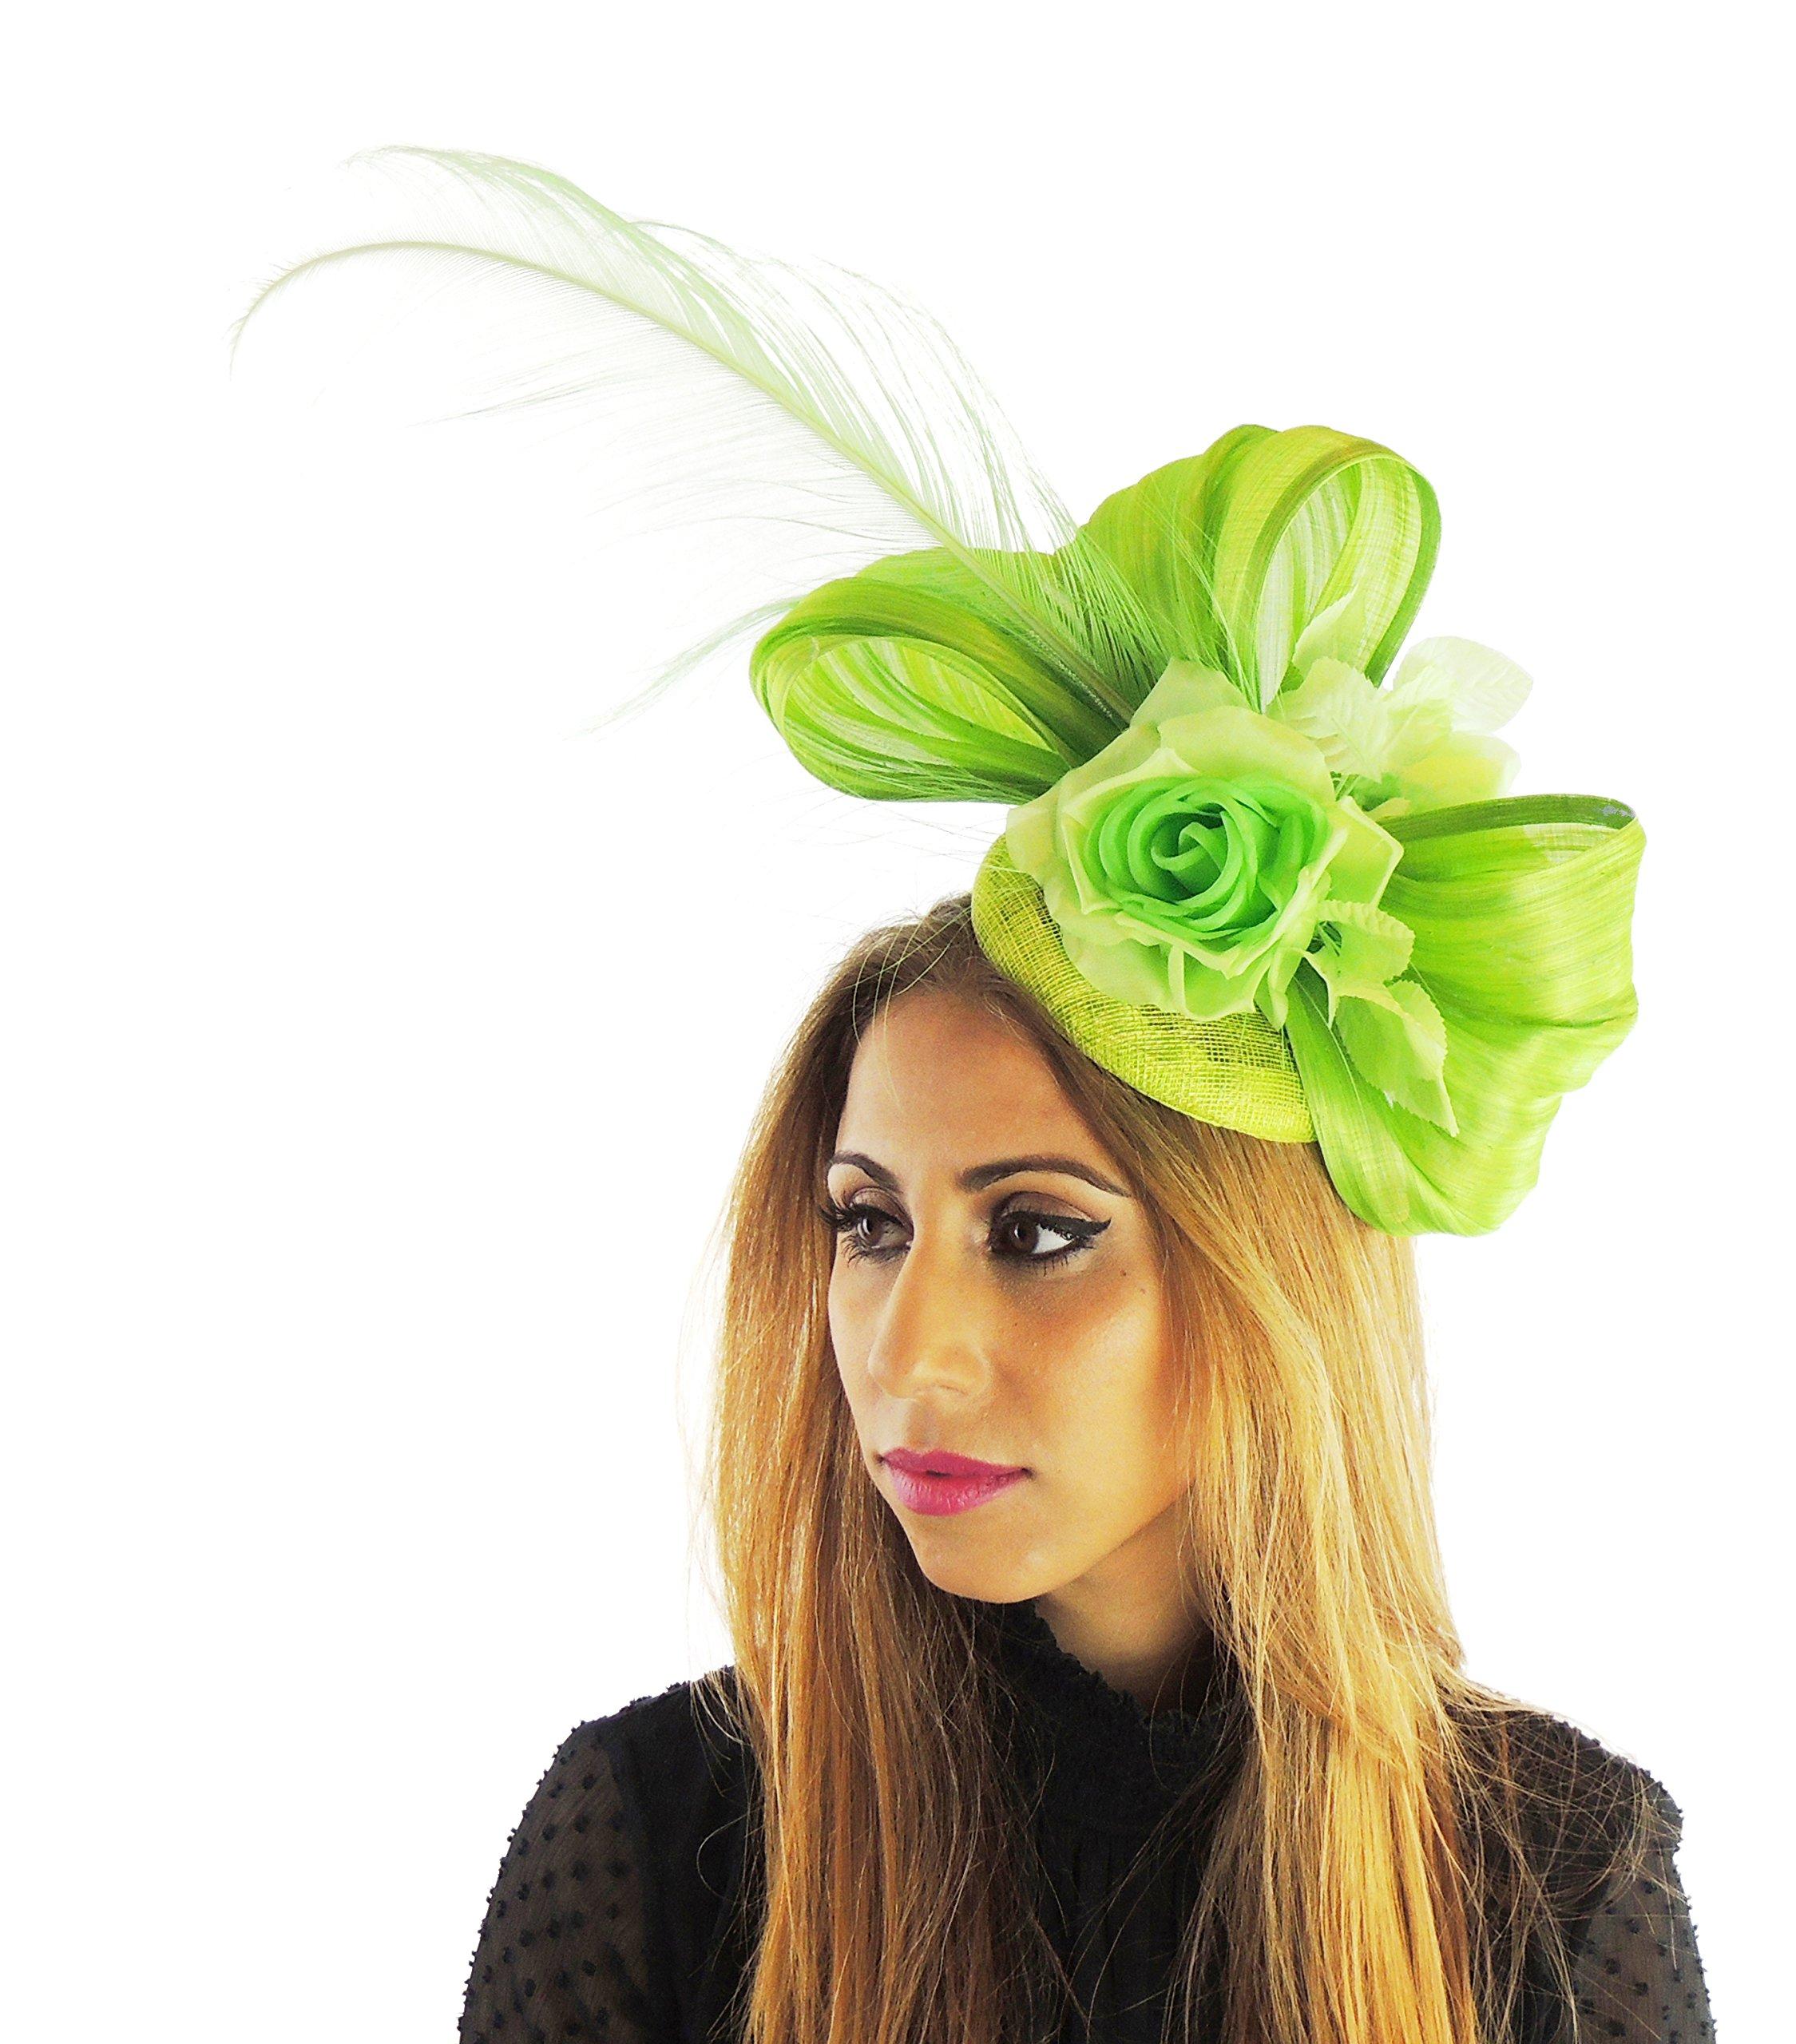 Hats By Cressida Silk Sinamay & Silk Flower Elegant Ladies Ascot Wedding Fascinator Hat Lime by Hats By Cressida